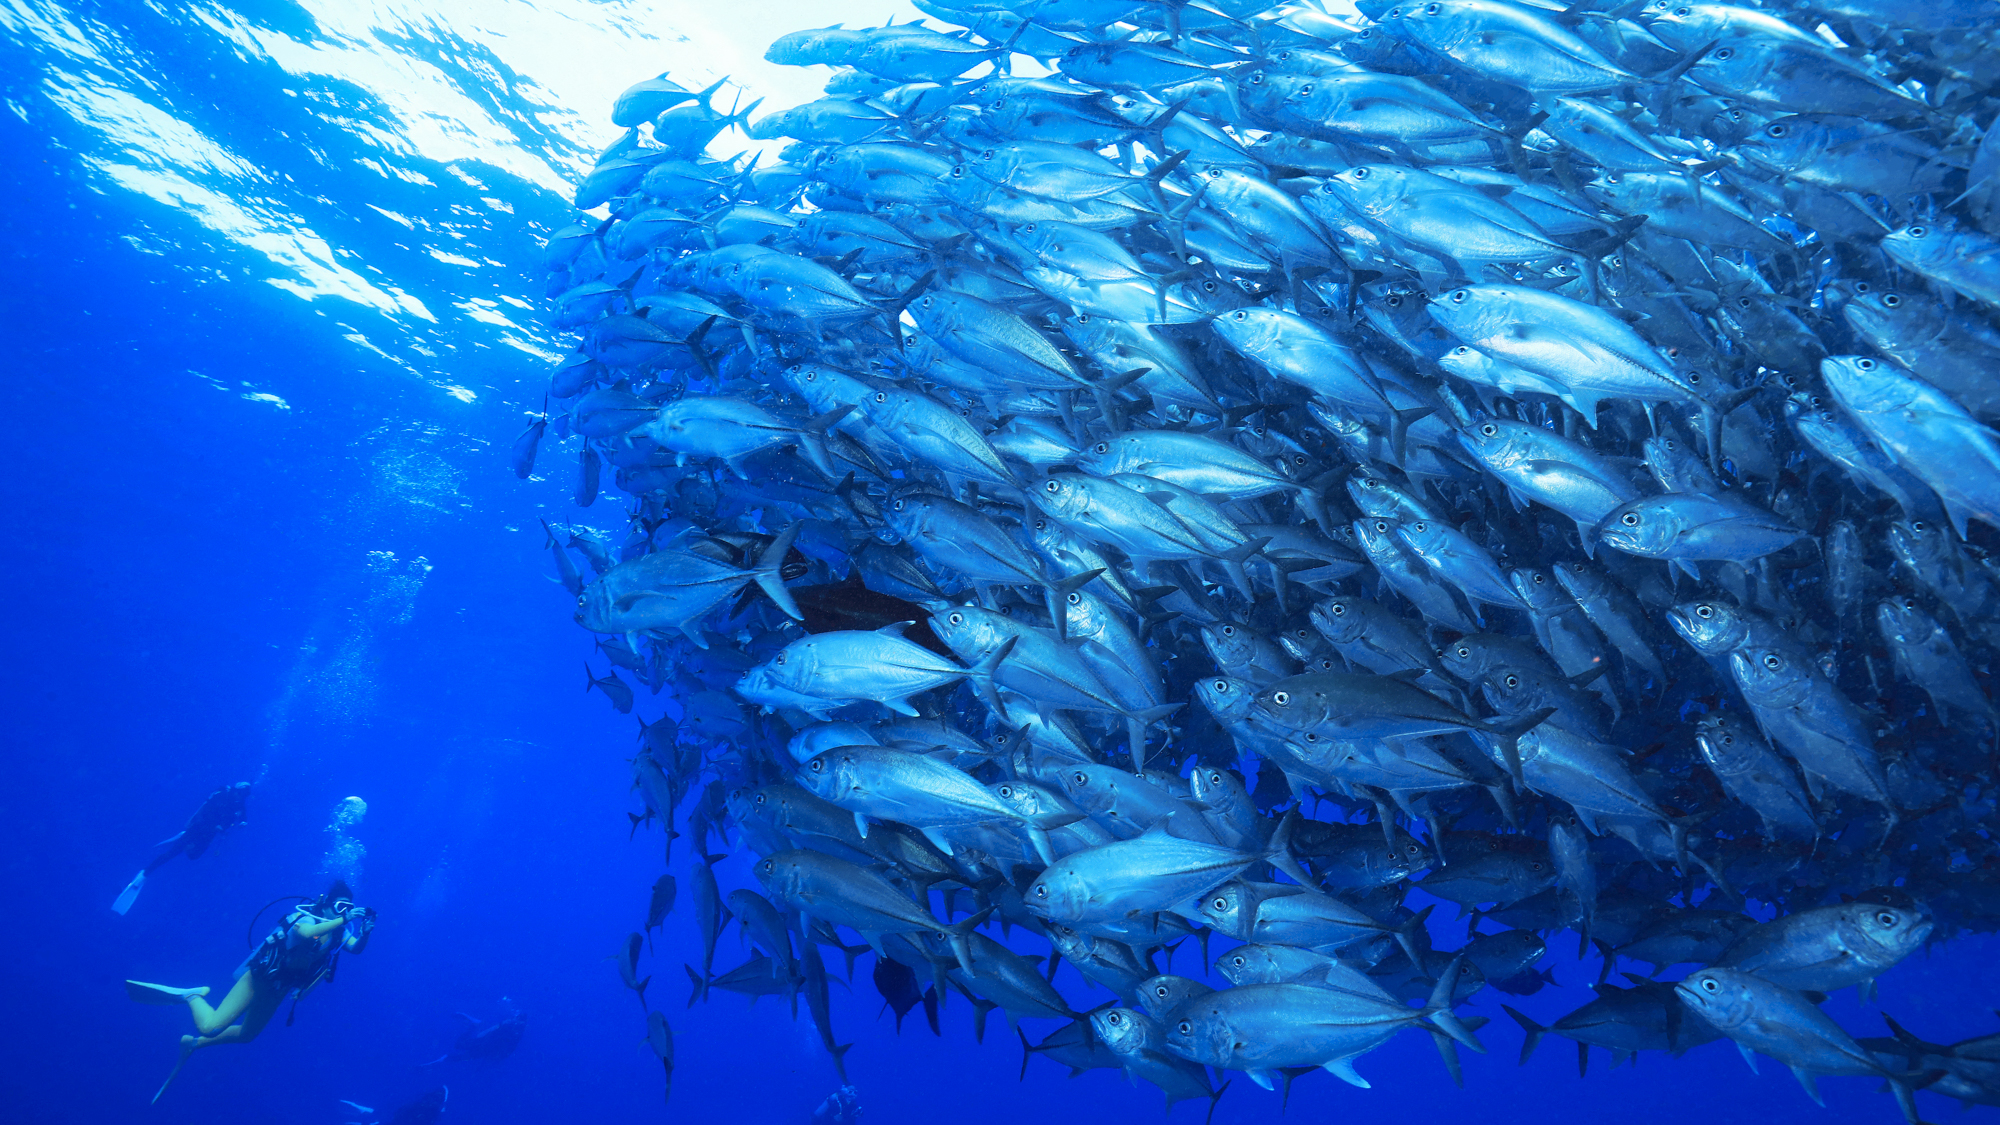 Drift diving at the Kerama islands in Okinawa